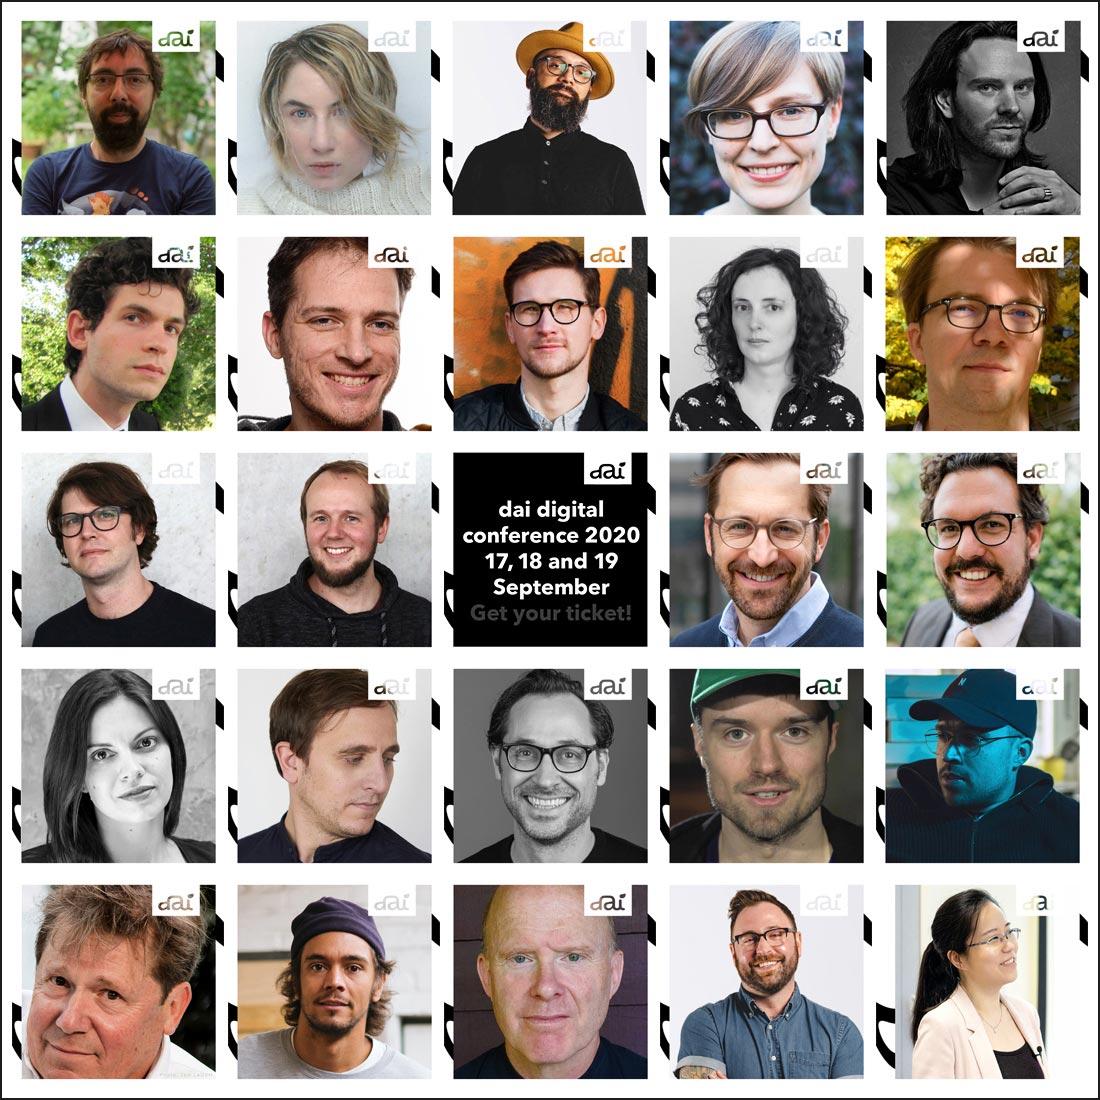 dai-all-speaker-personalities-2020